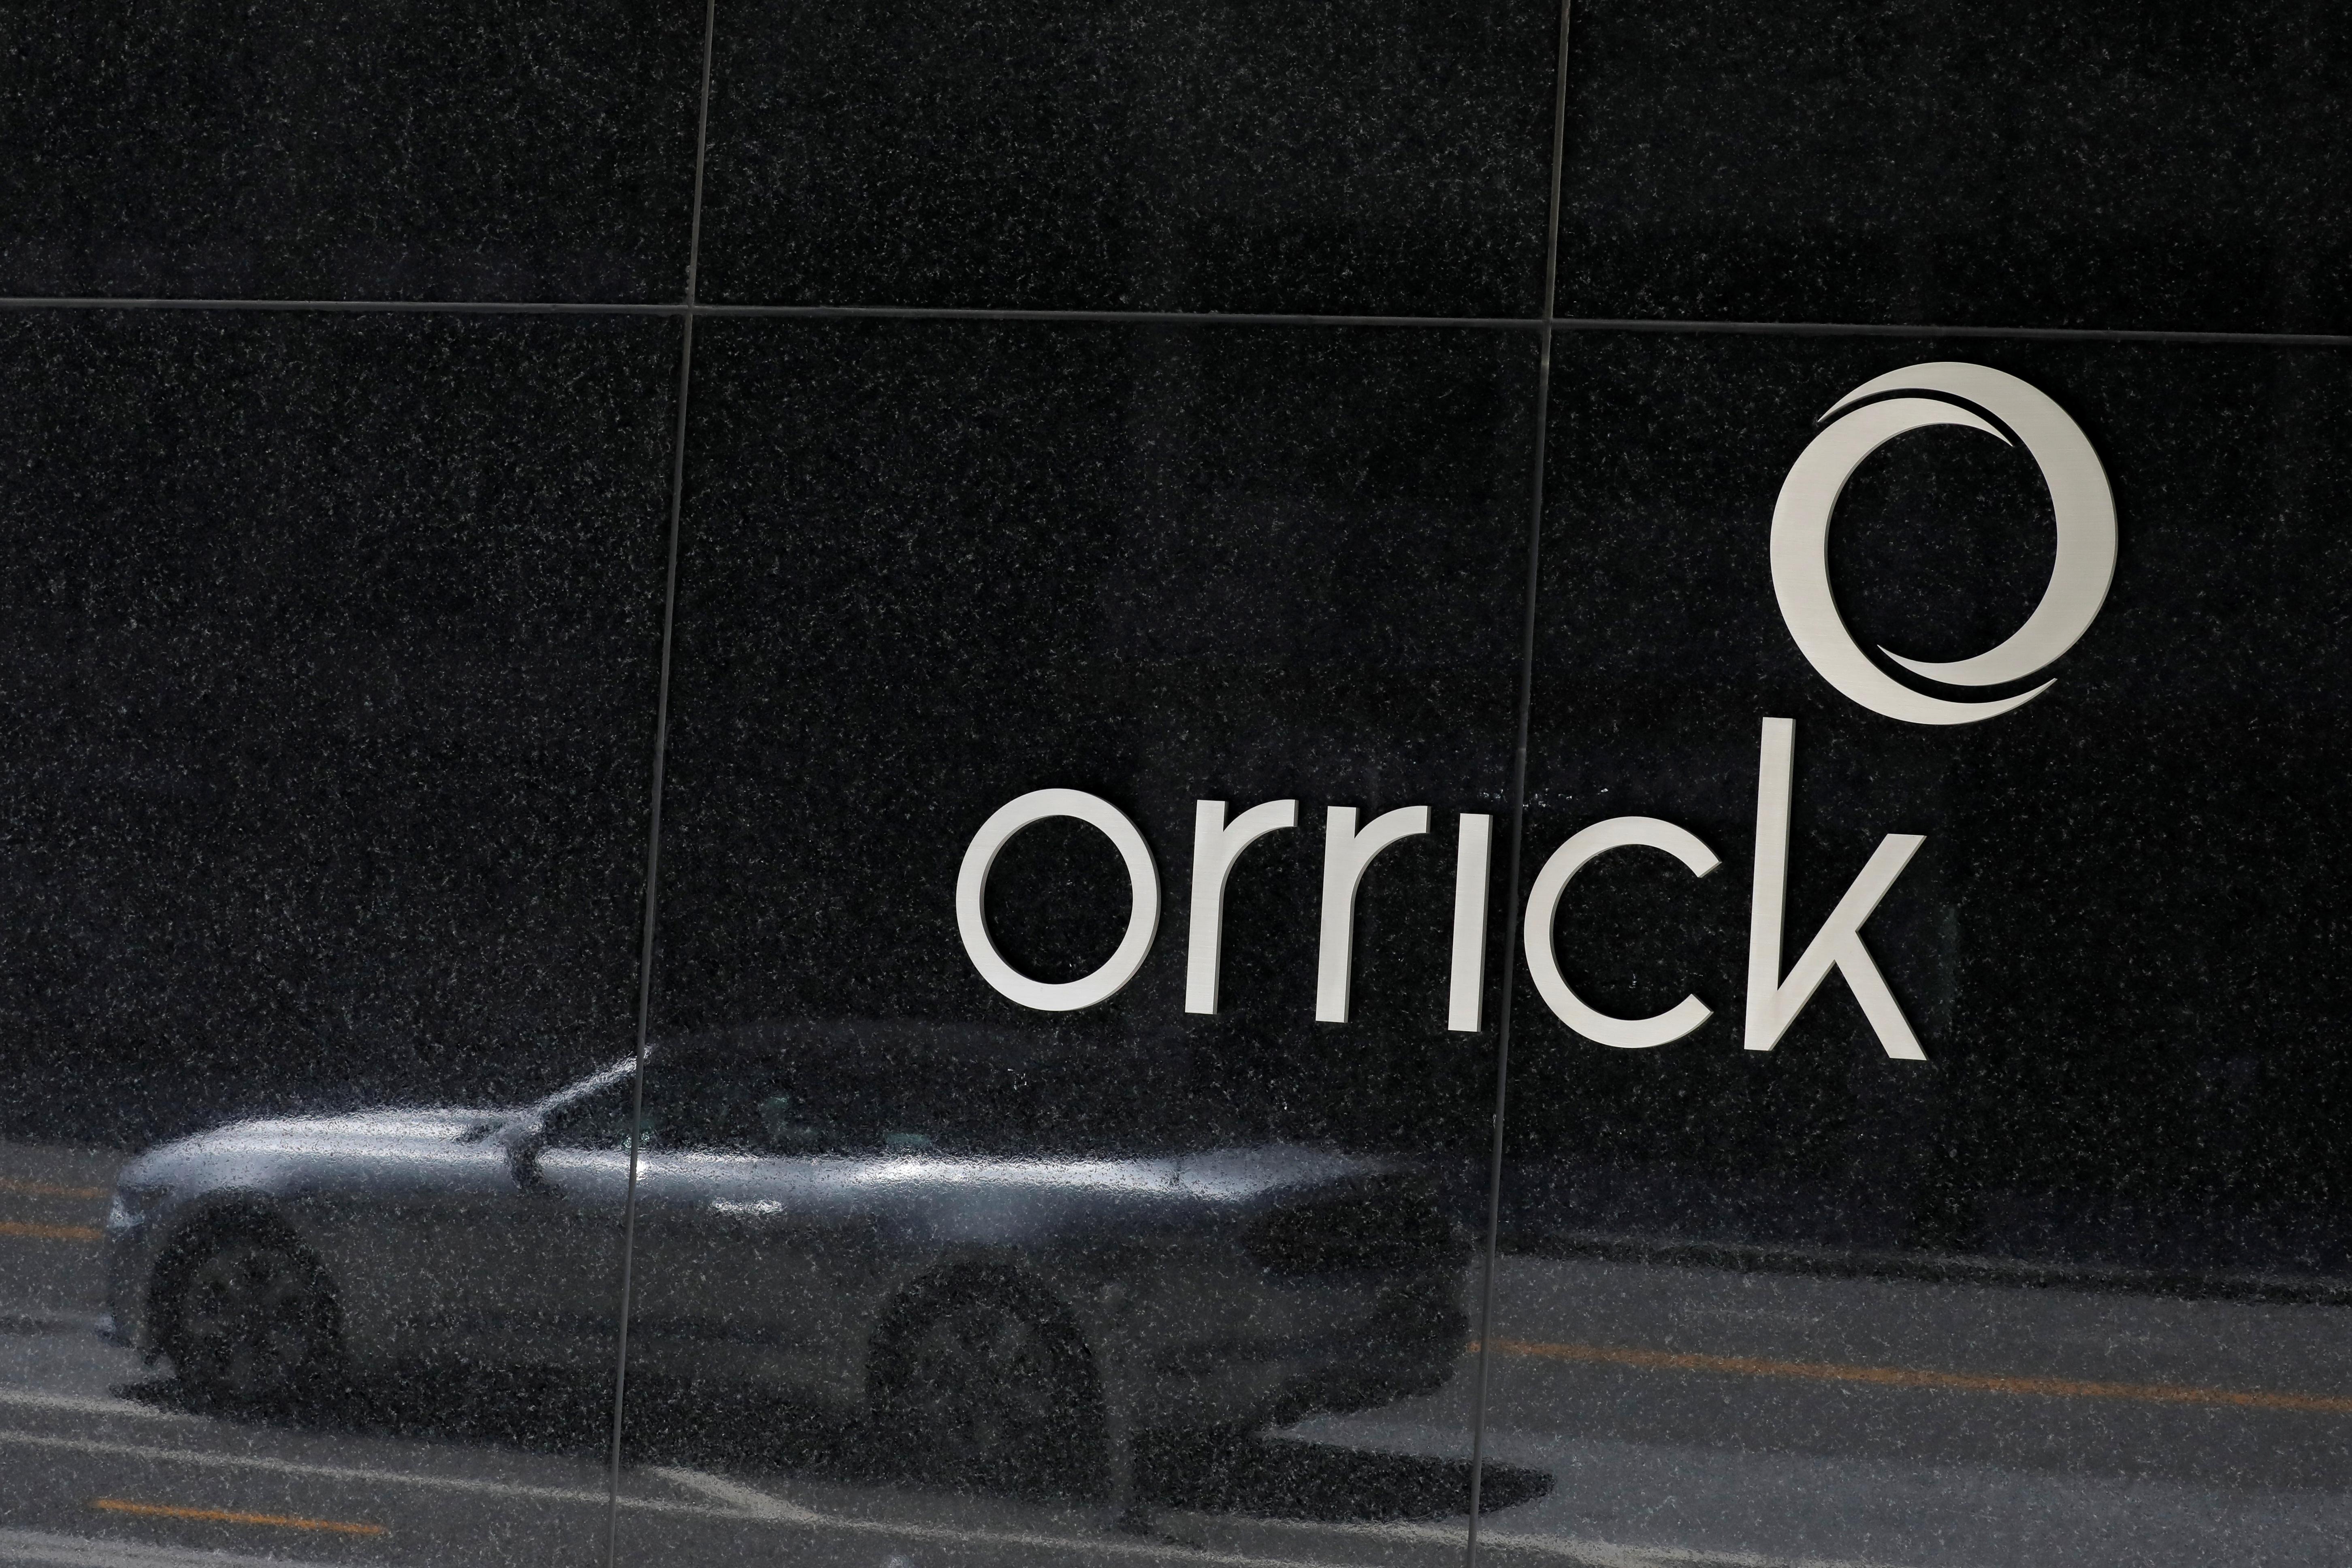 Orrick, Herrington & Sutcliffe offices in Washington, D.C. REUTERS/Andrew Kelly